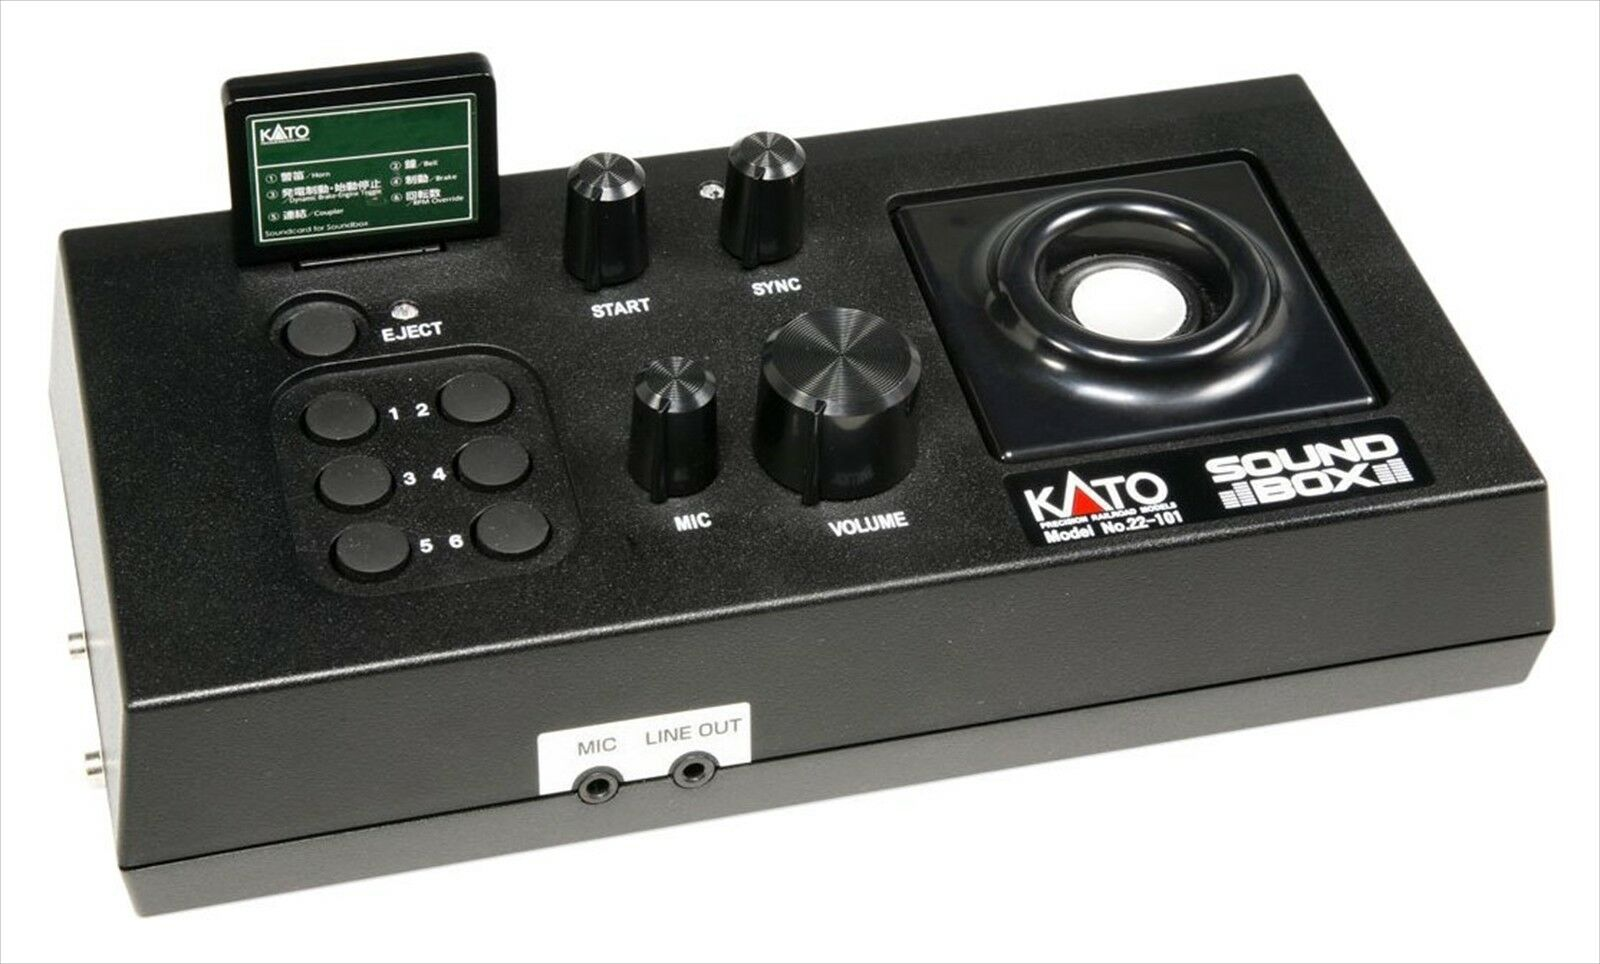 KATO N gauge Sound Box 22-101 model railroad supplies